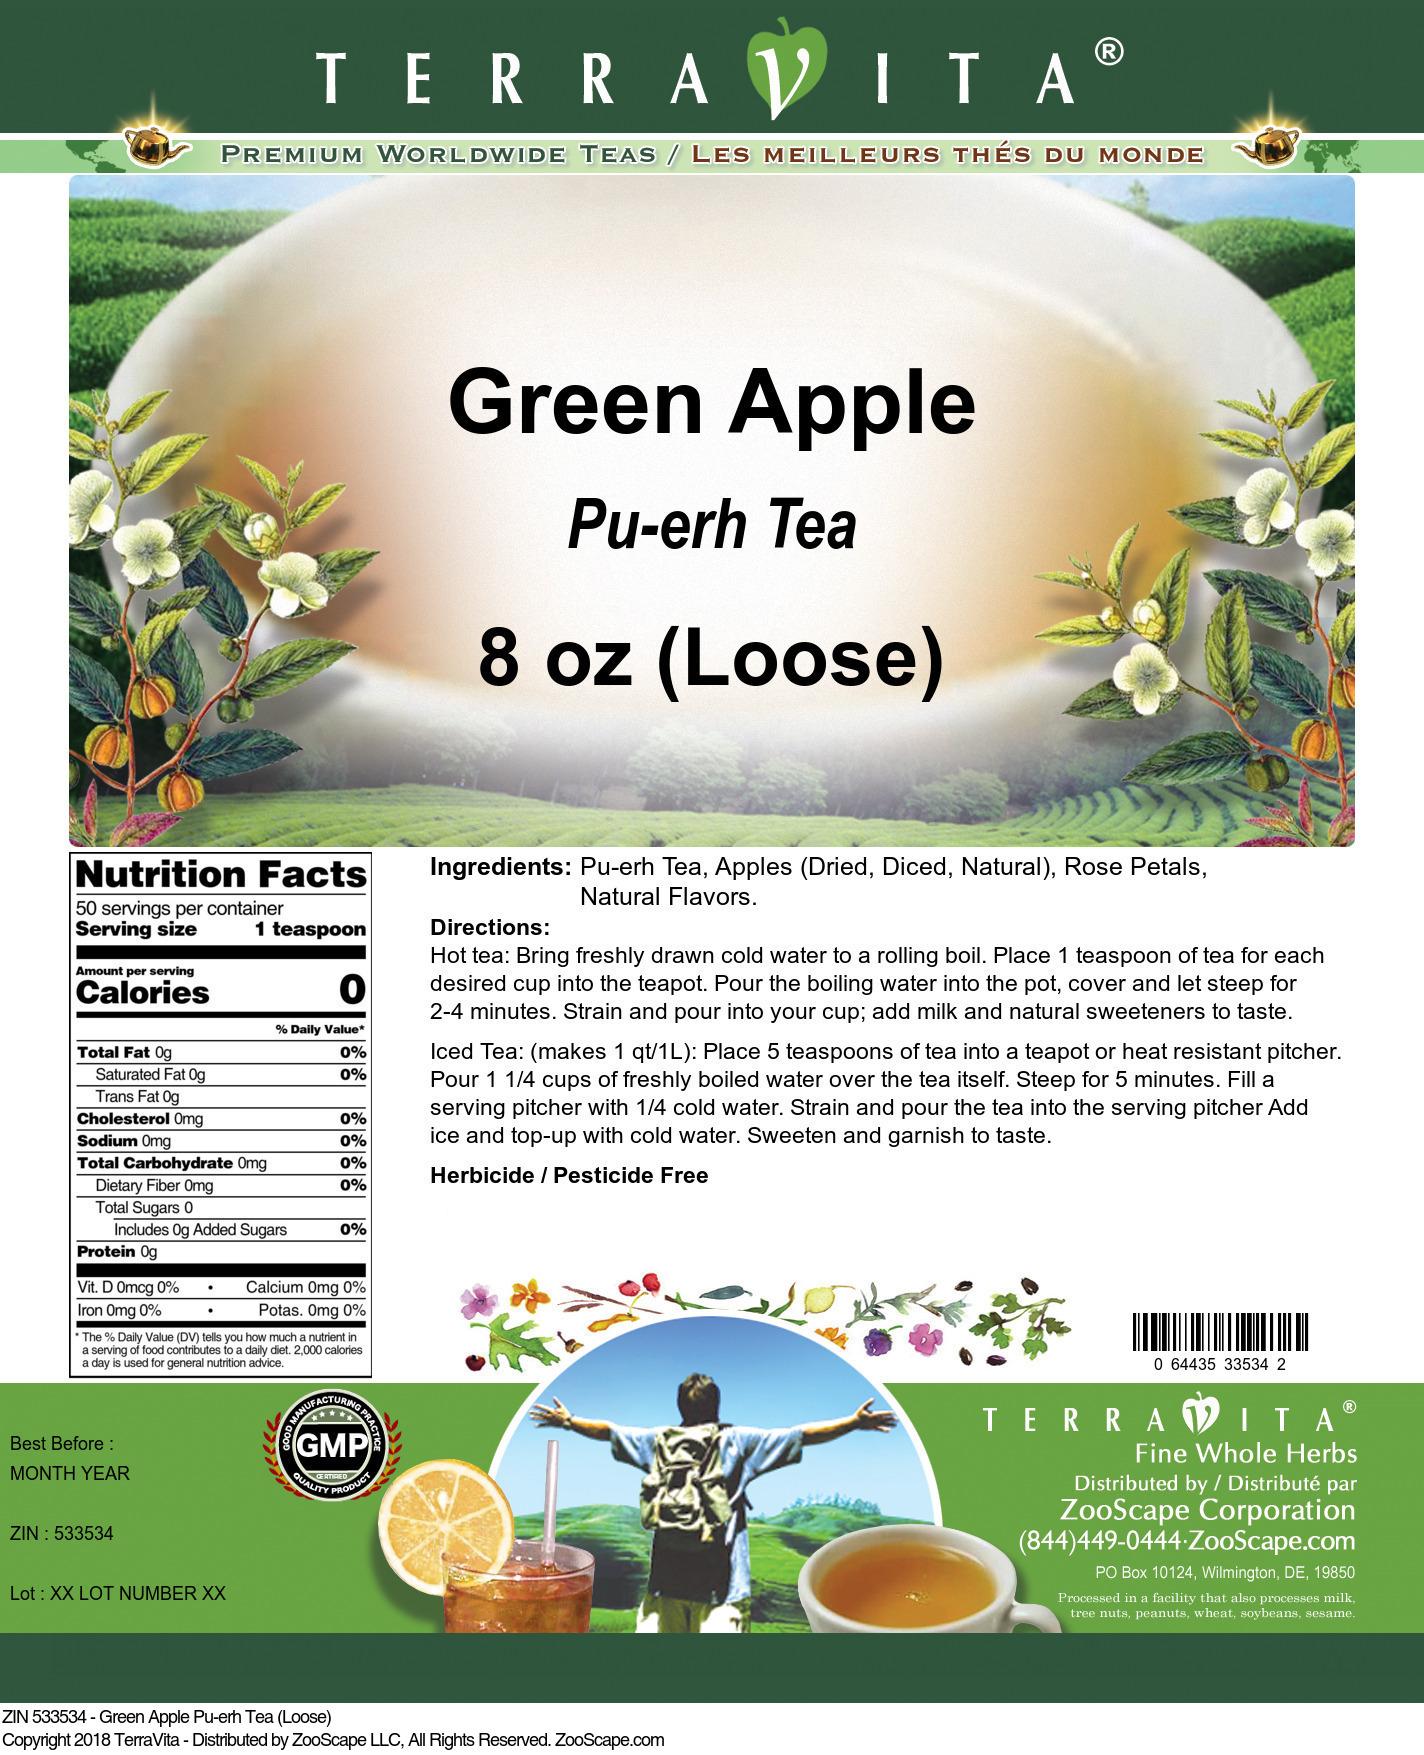 Green Apple Pu-erh Tea